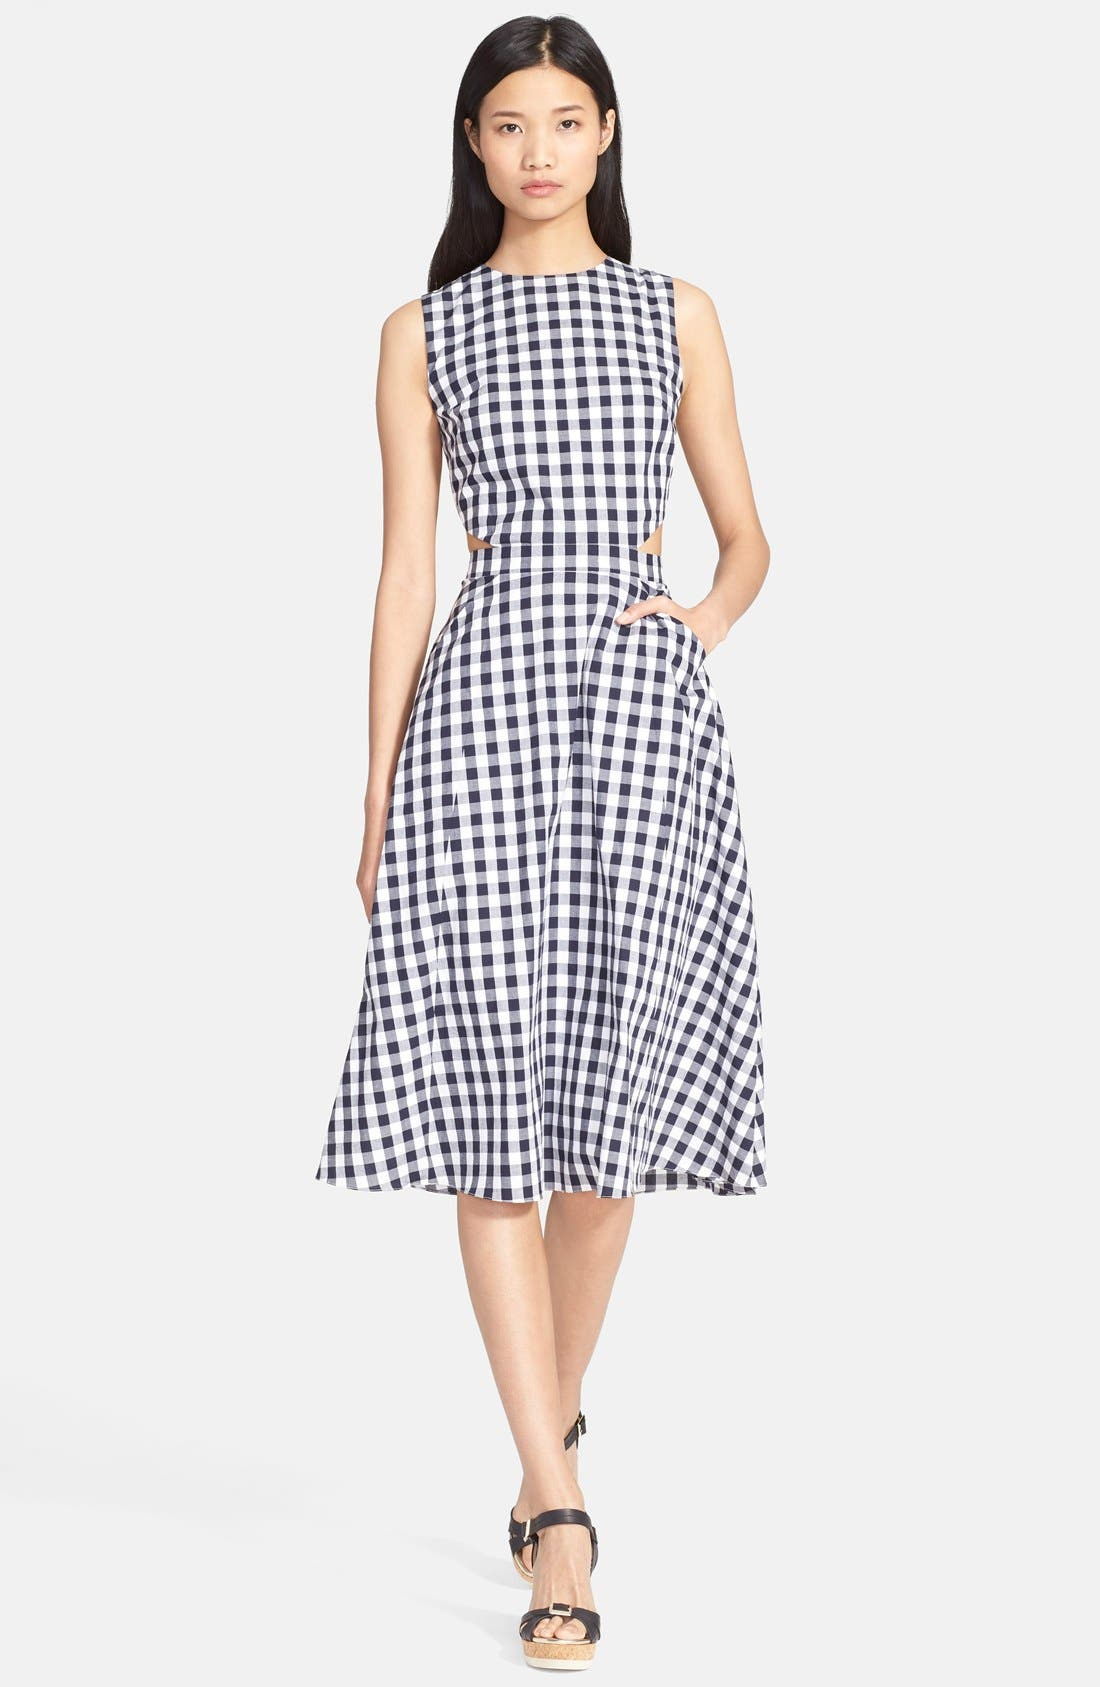 Alternate Image 1 Selected - Tanya Taylor 'Monica' Gingham Fit & Flare Dress